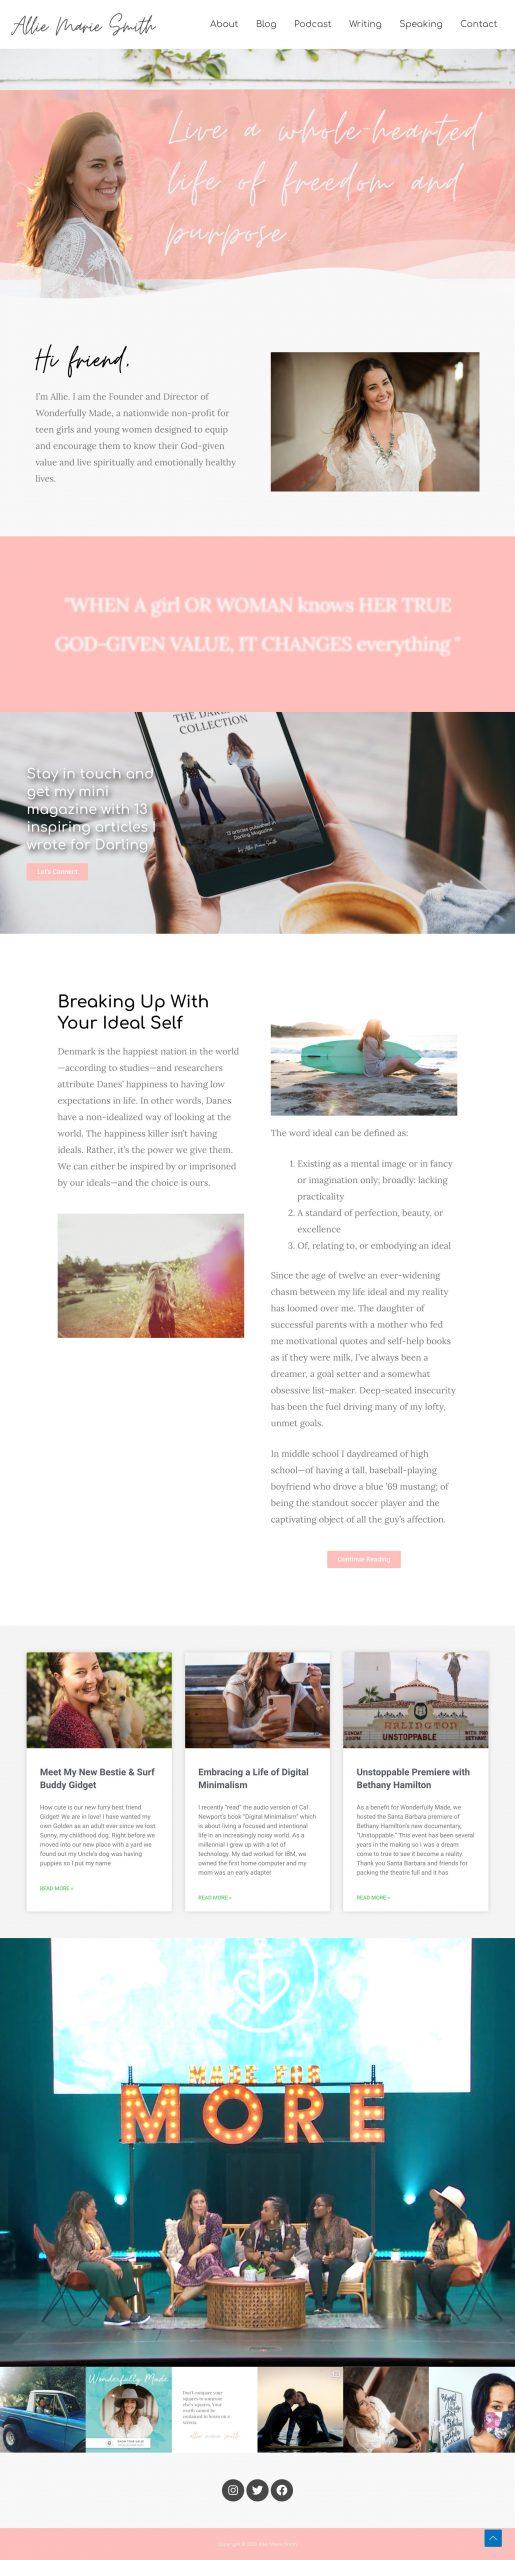 Screenshot of Webpage work